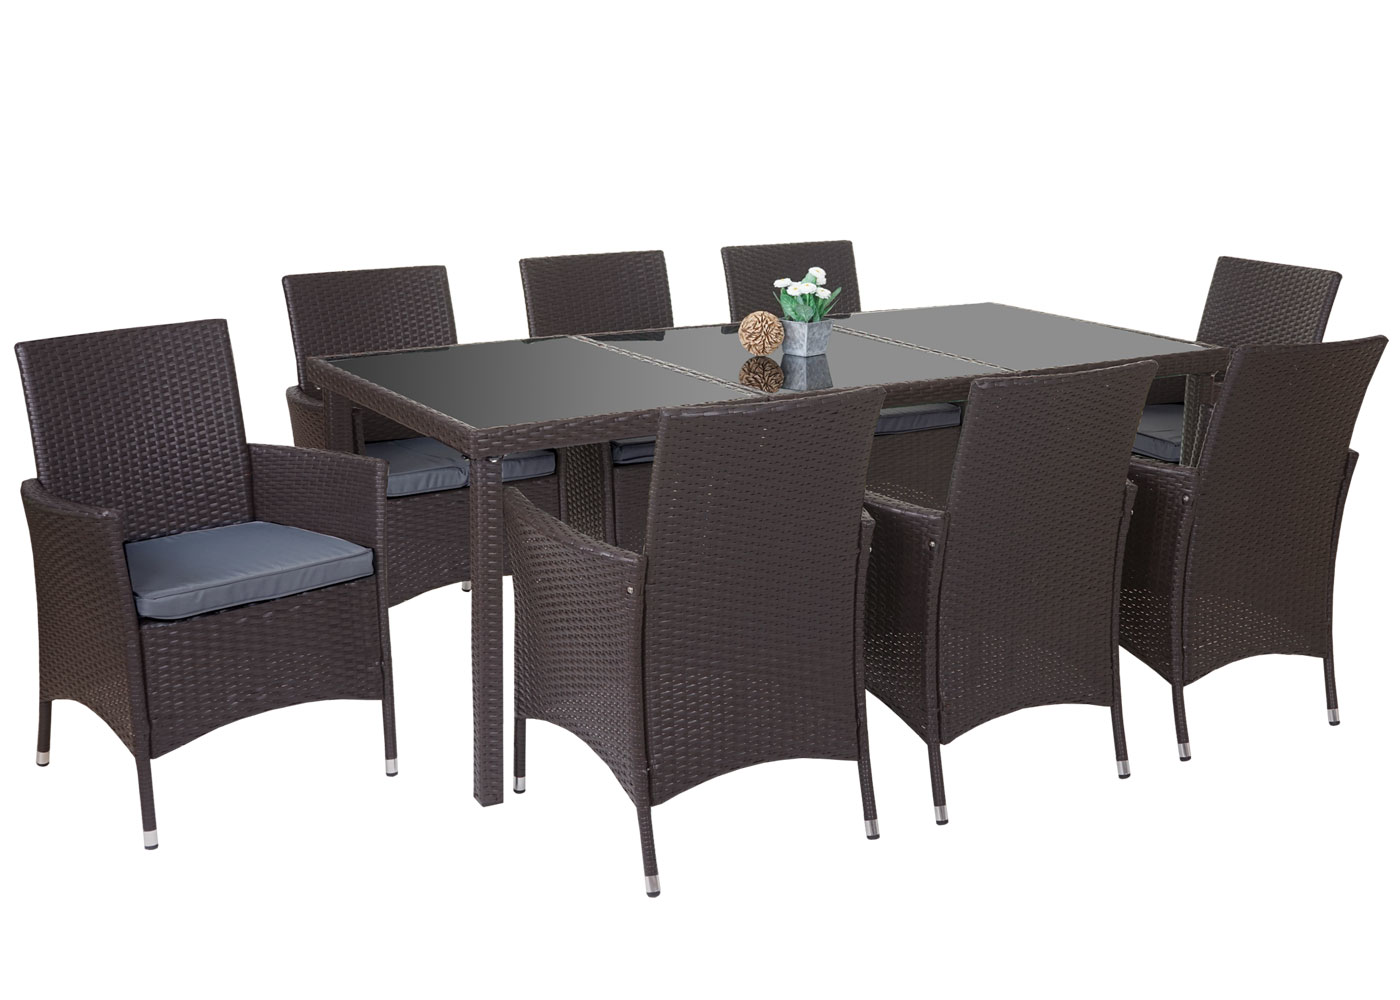 poly rattan garnitur terni garten sitzgruppe tisch 8 sessel alu braun kissen grau. Black Bedroom Furniture Sets. Home Design Ideas